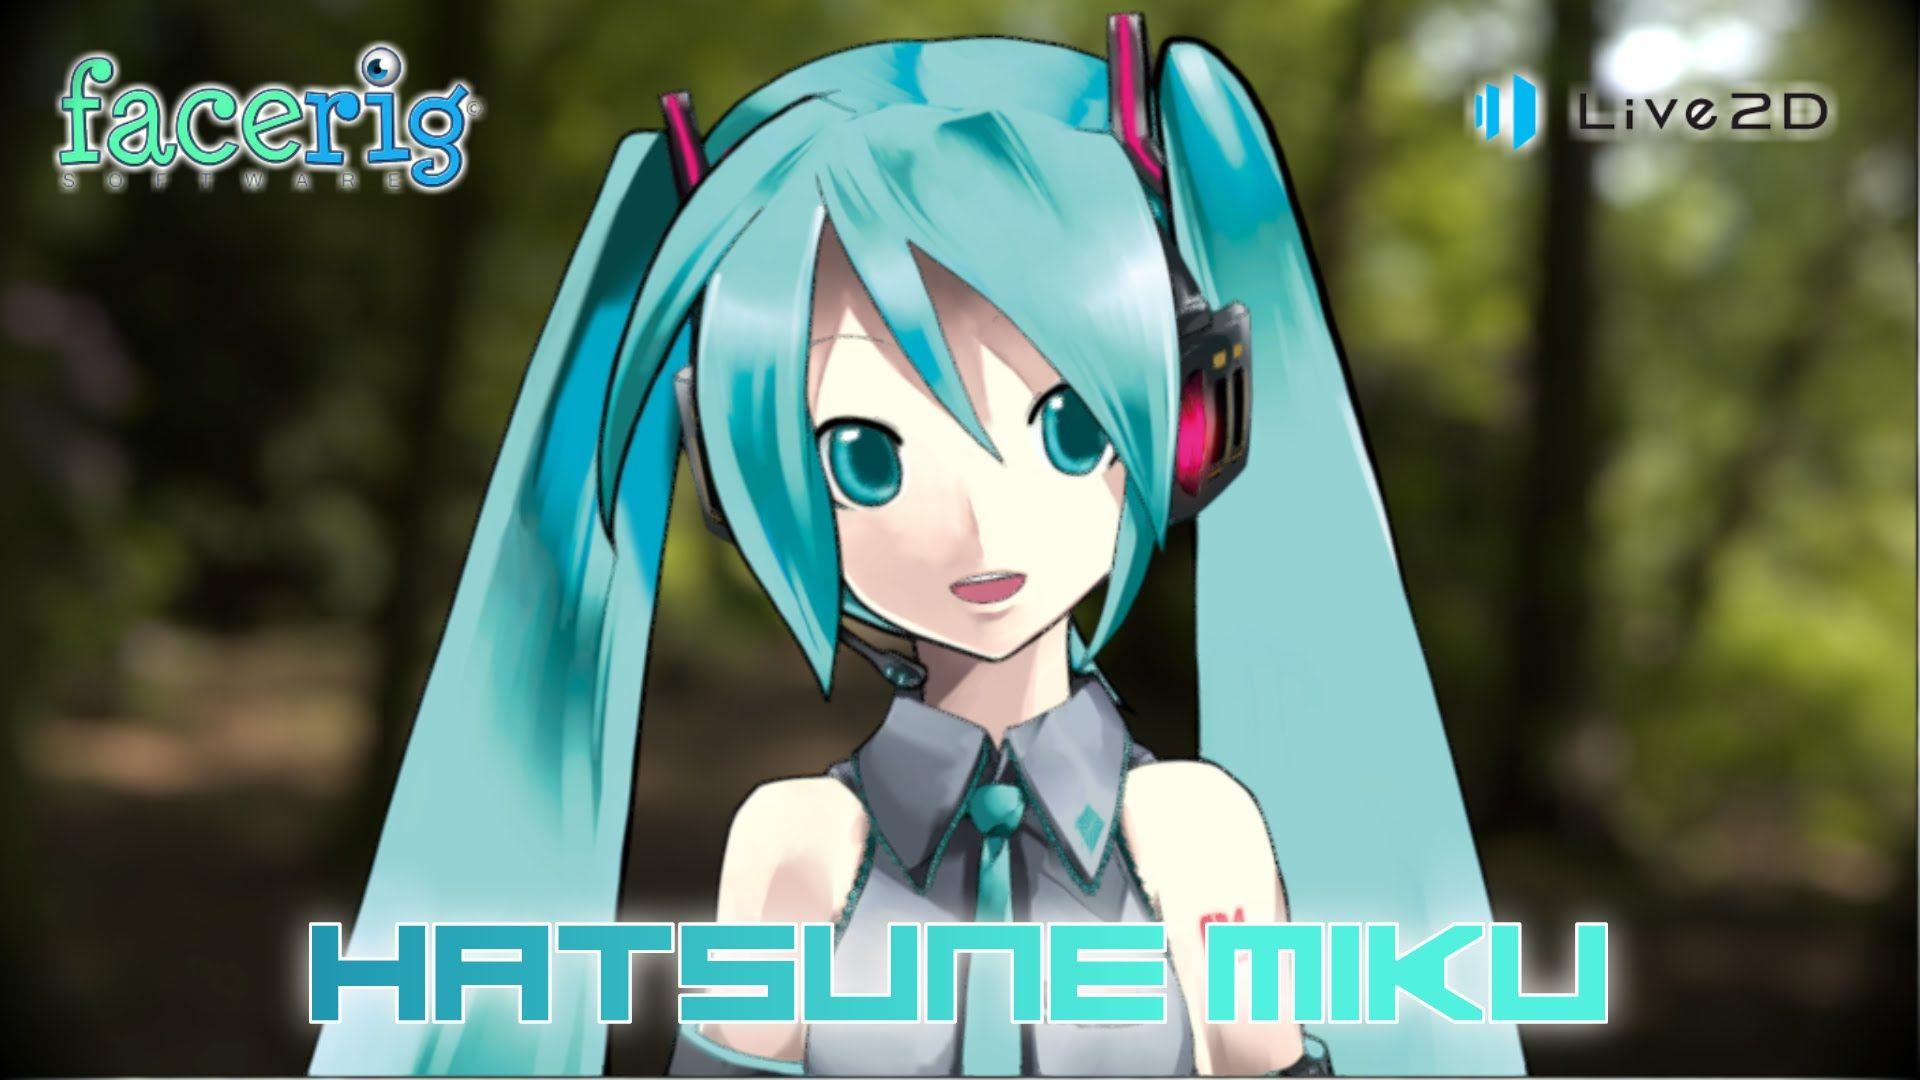 Facerig - Live2d - Hatsune Miku! | Live2D | Hatsune miku